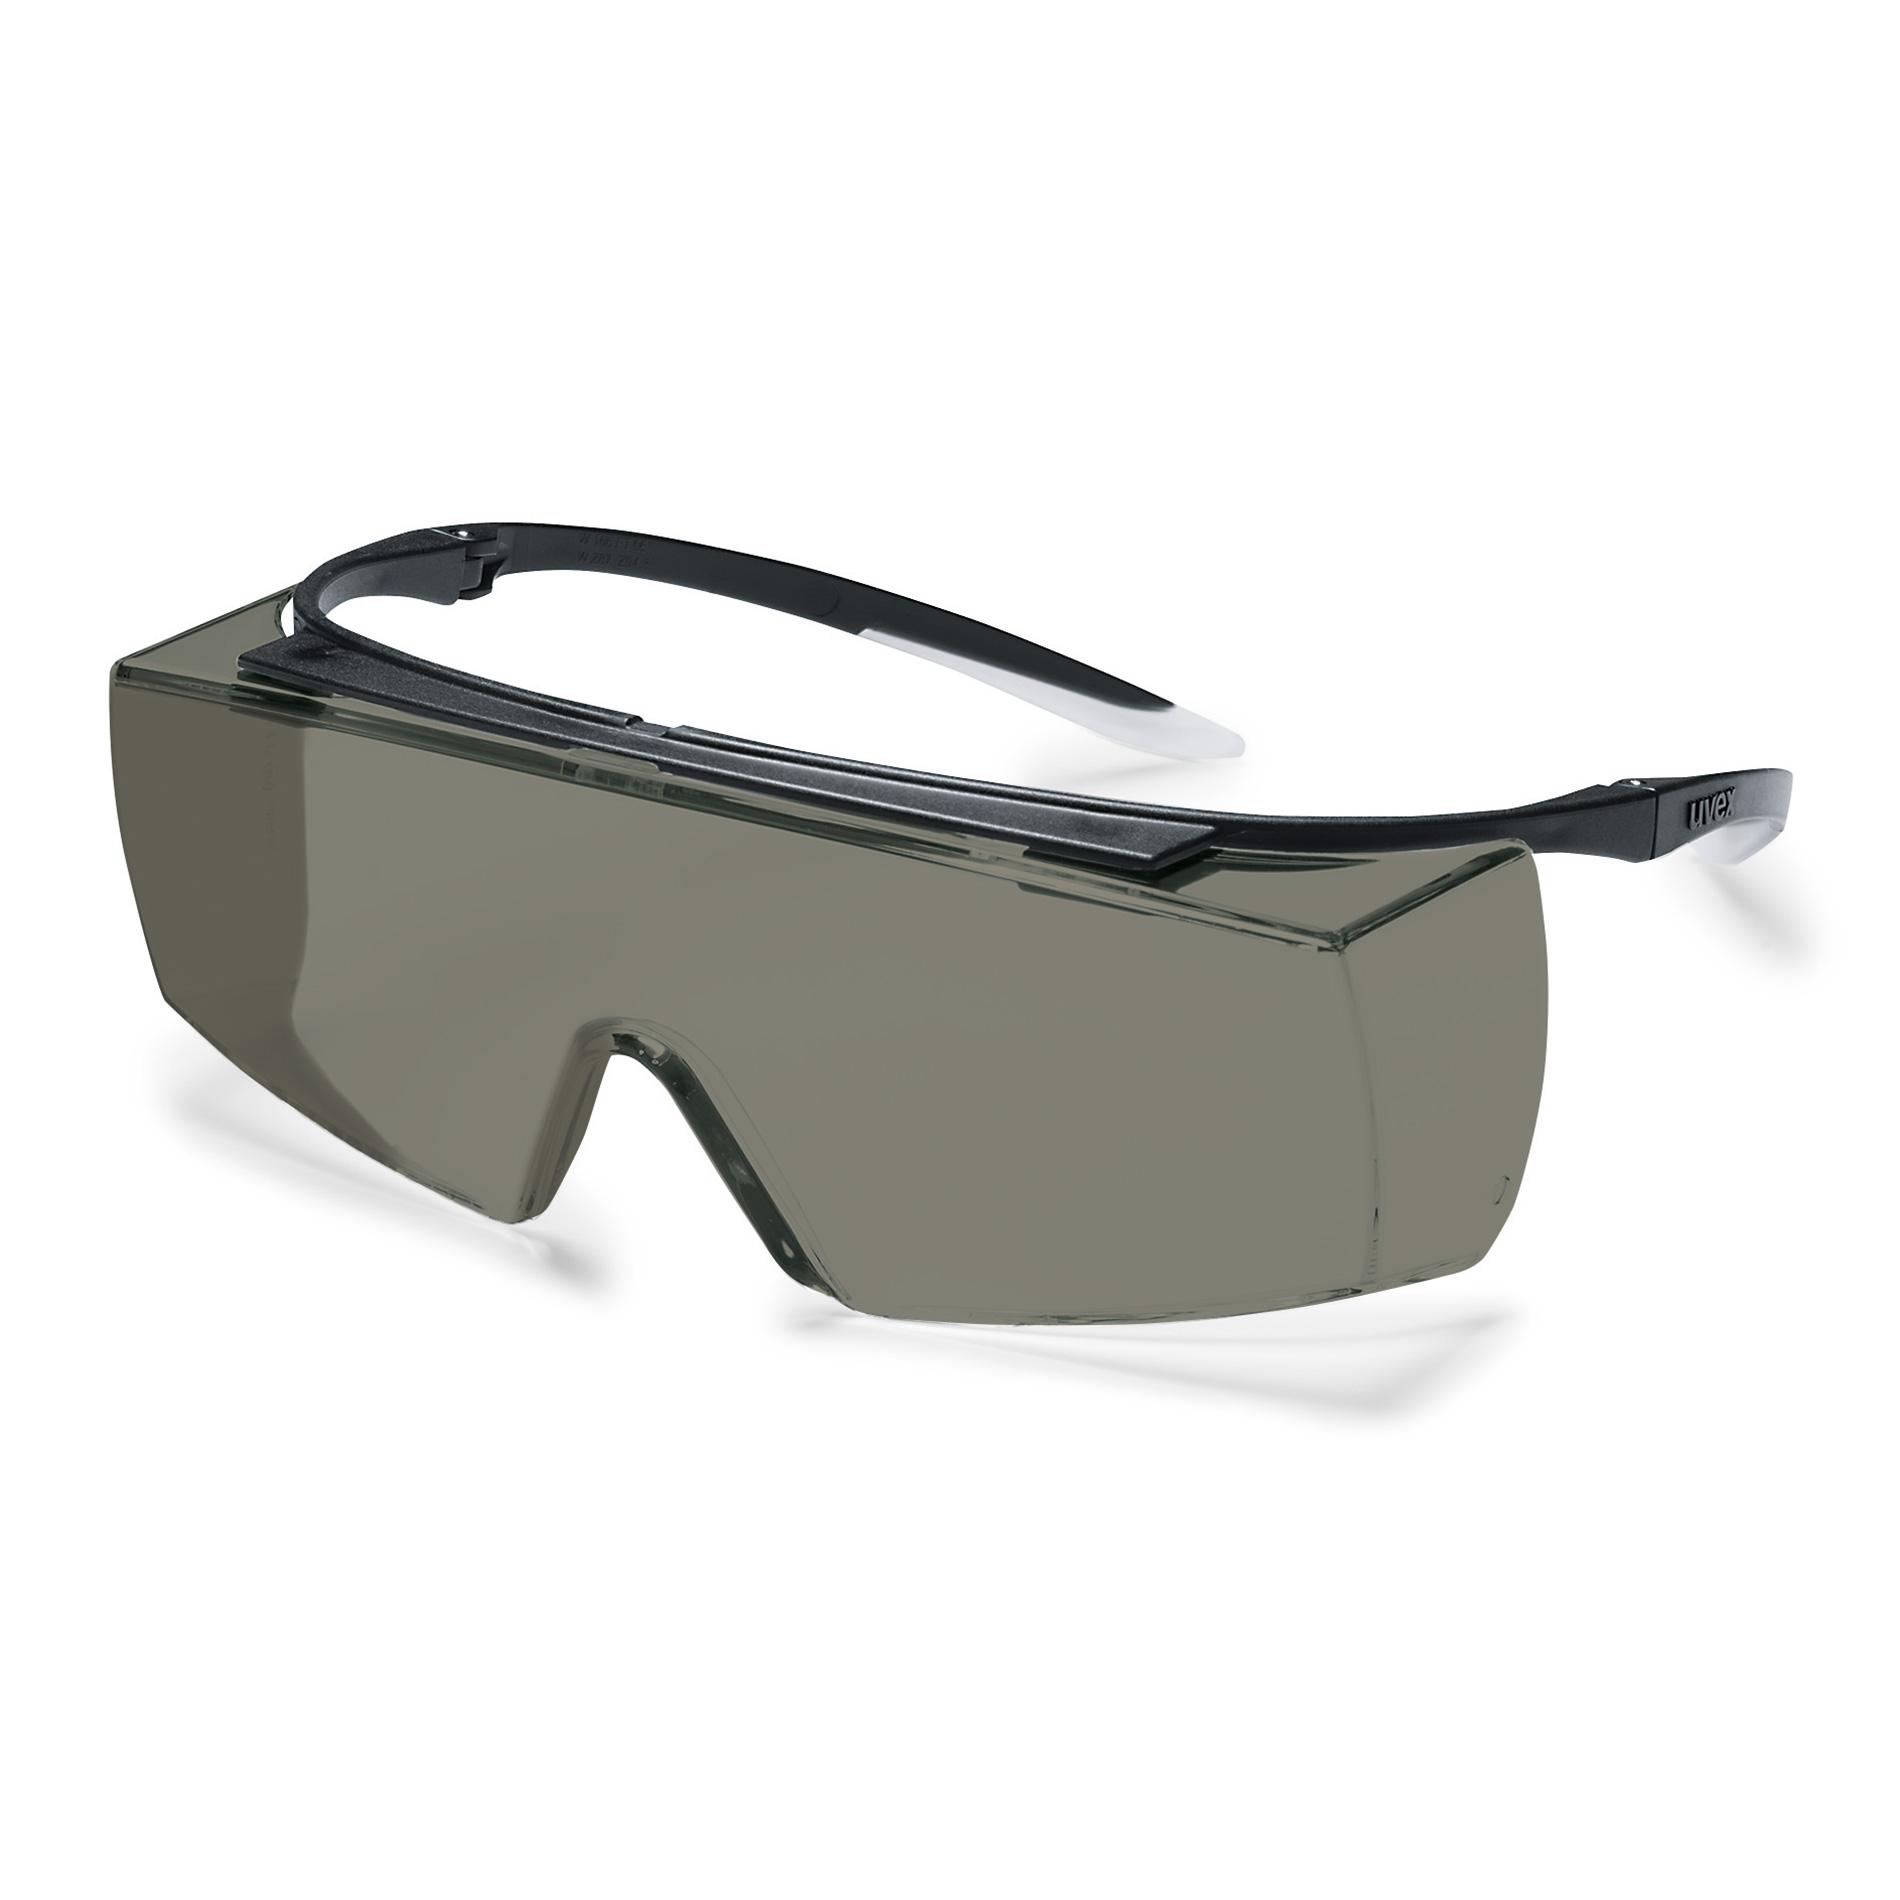 76d392fbf1 Uvex Prescription Safety Glasses Online